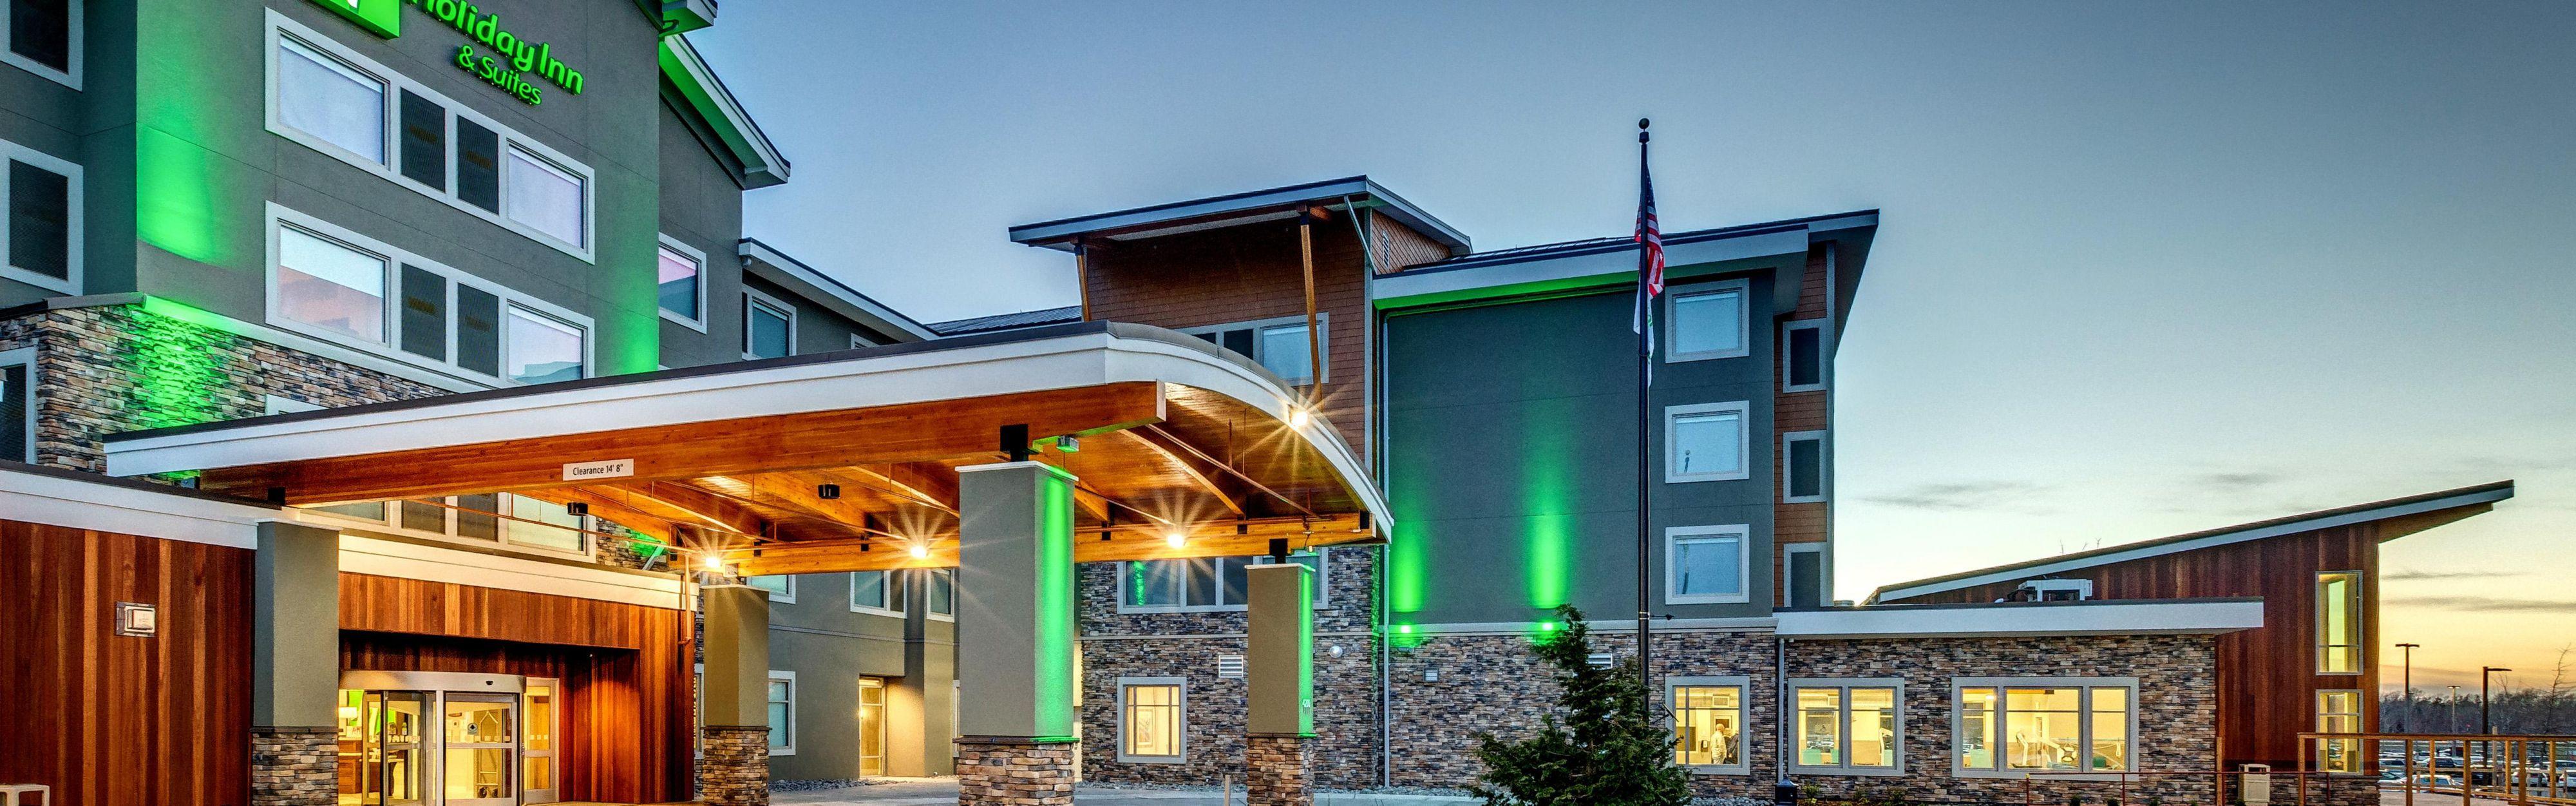 Holiday Inn & Suites Bellingham image 0